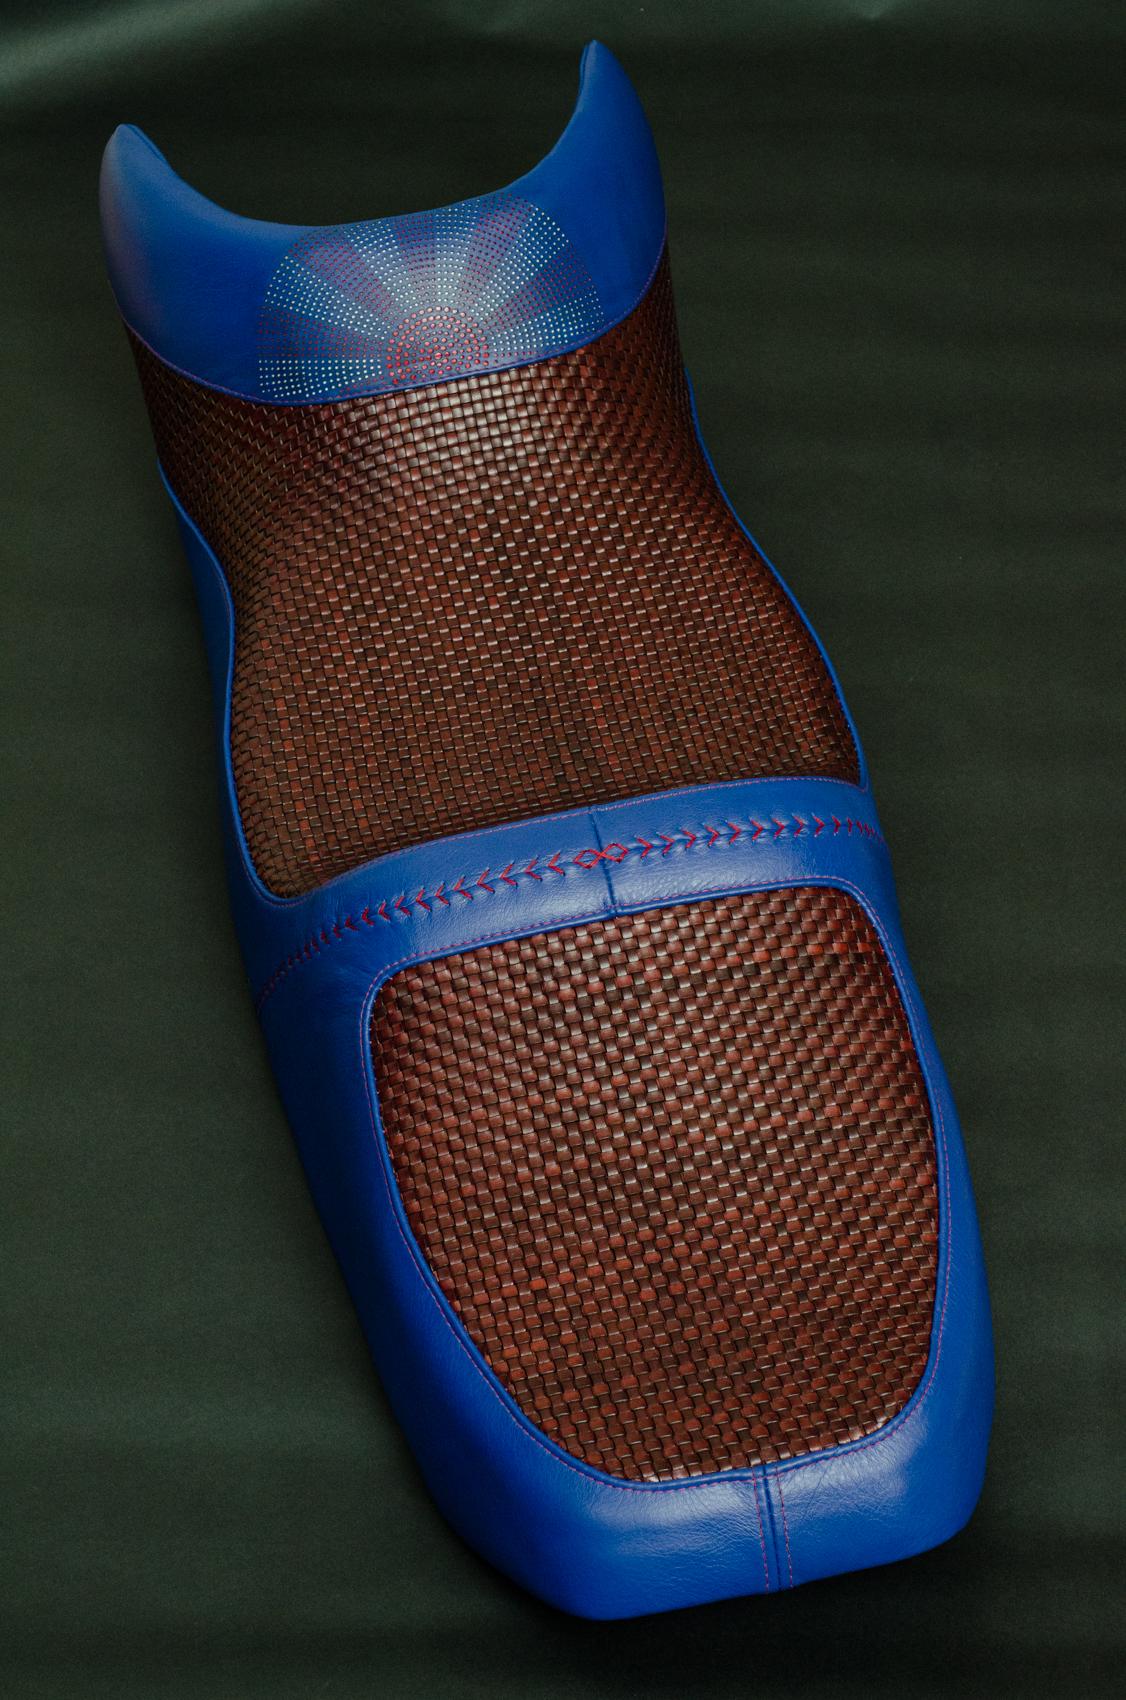 Honda VFR woven rising sun saddle custom leather hand made usa leh cycling goods -1.jpg